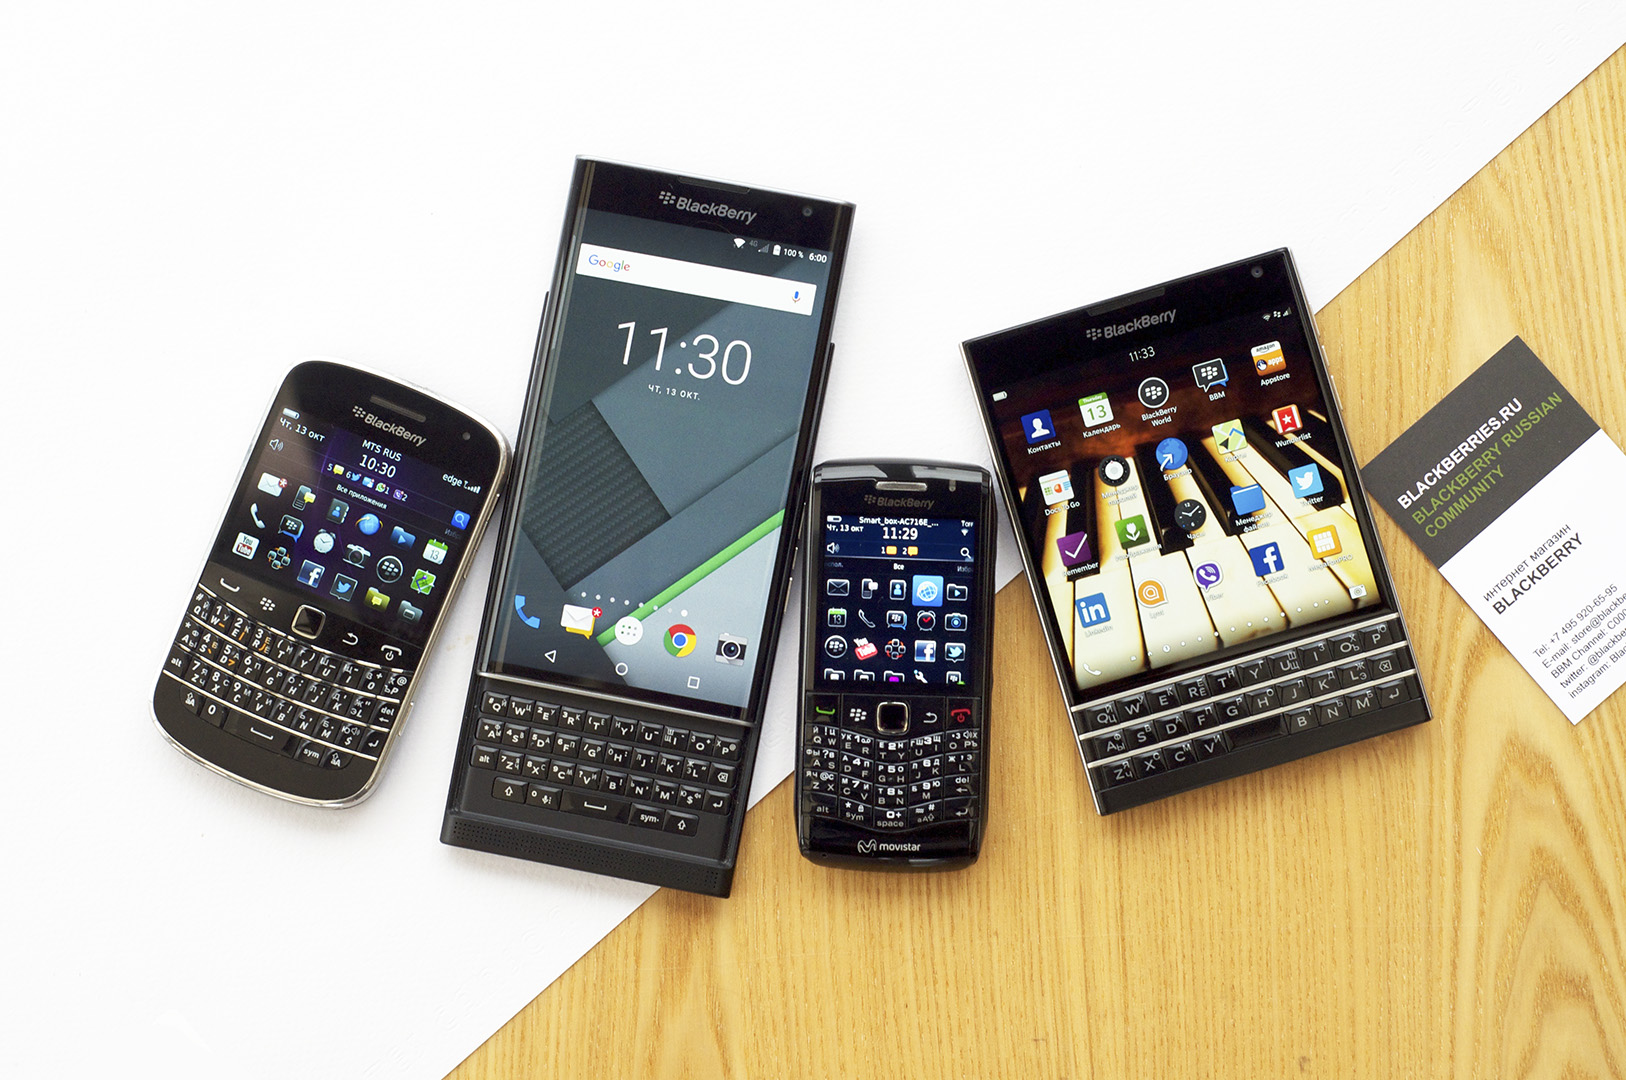 blackberry-9100-pearl-3g-19